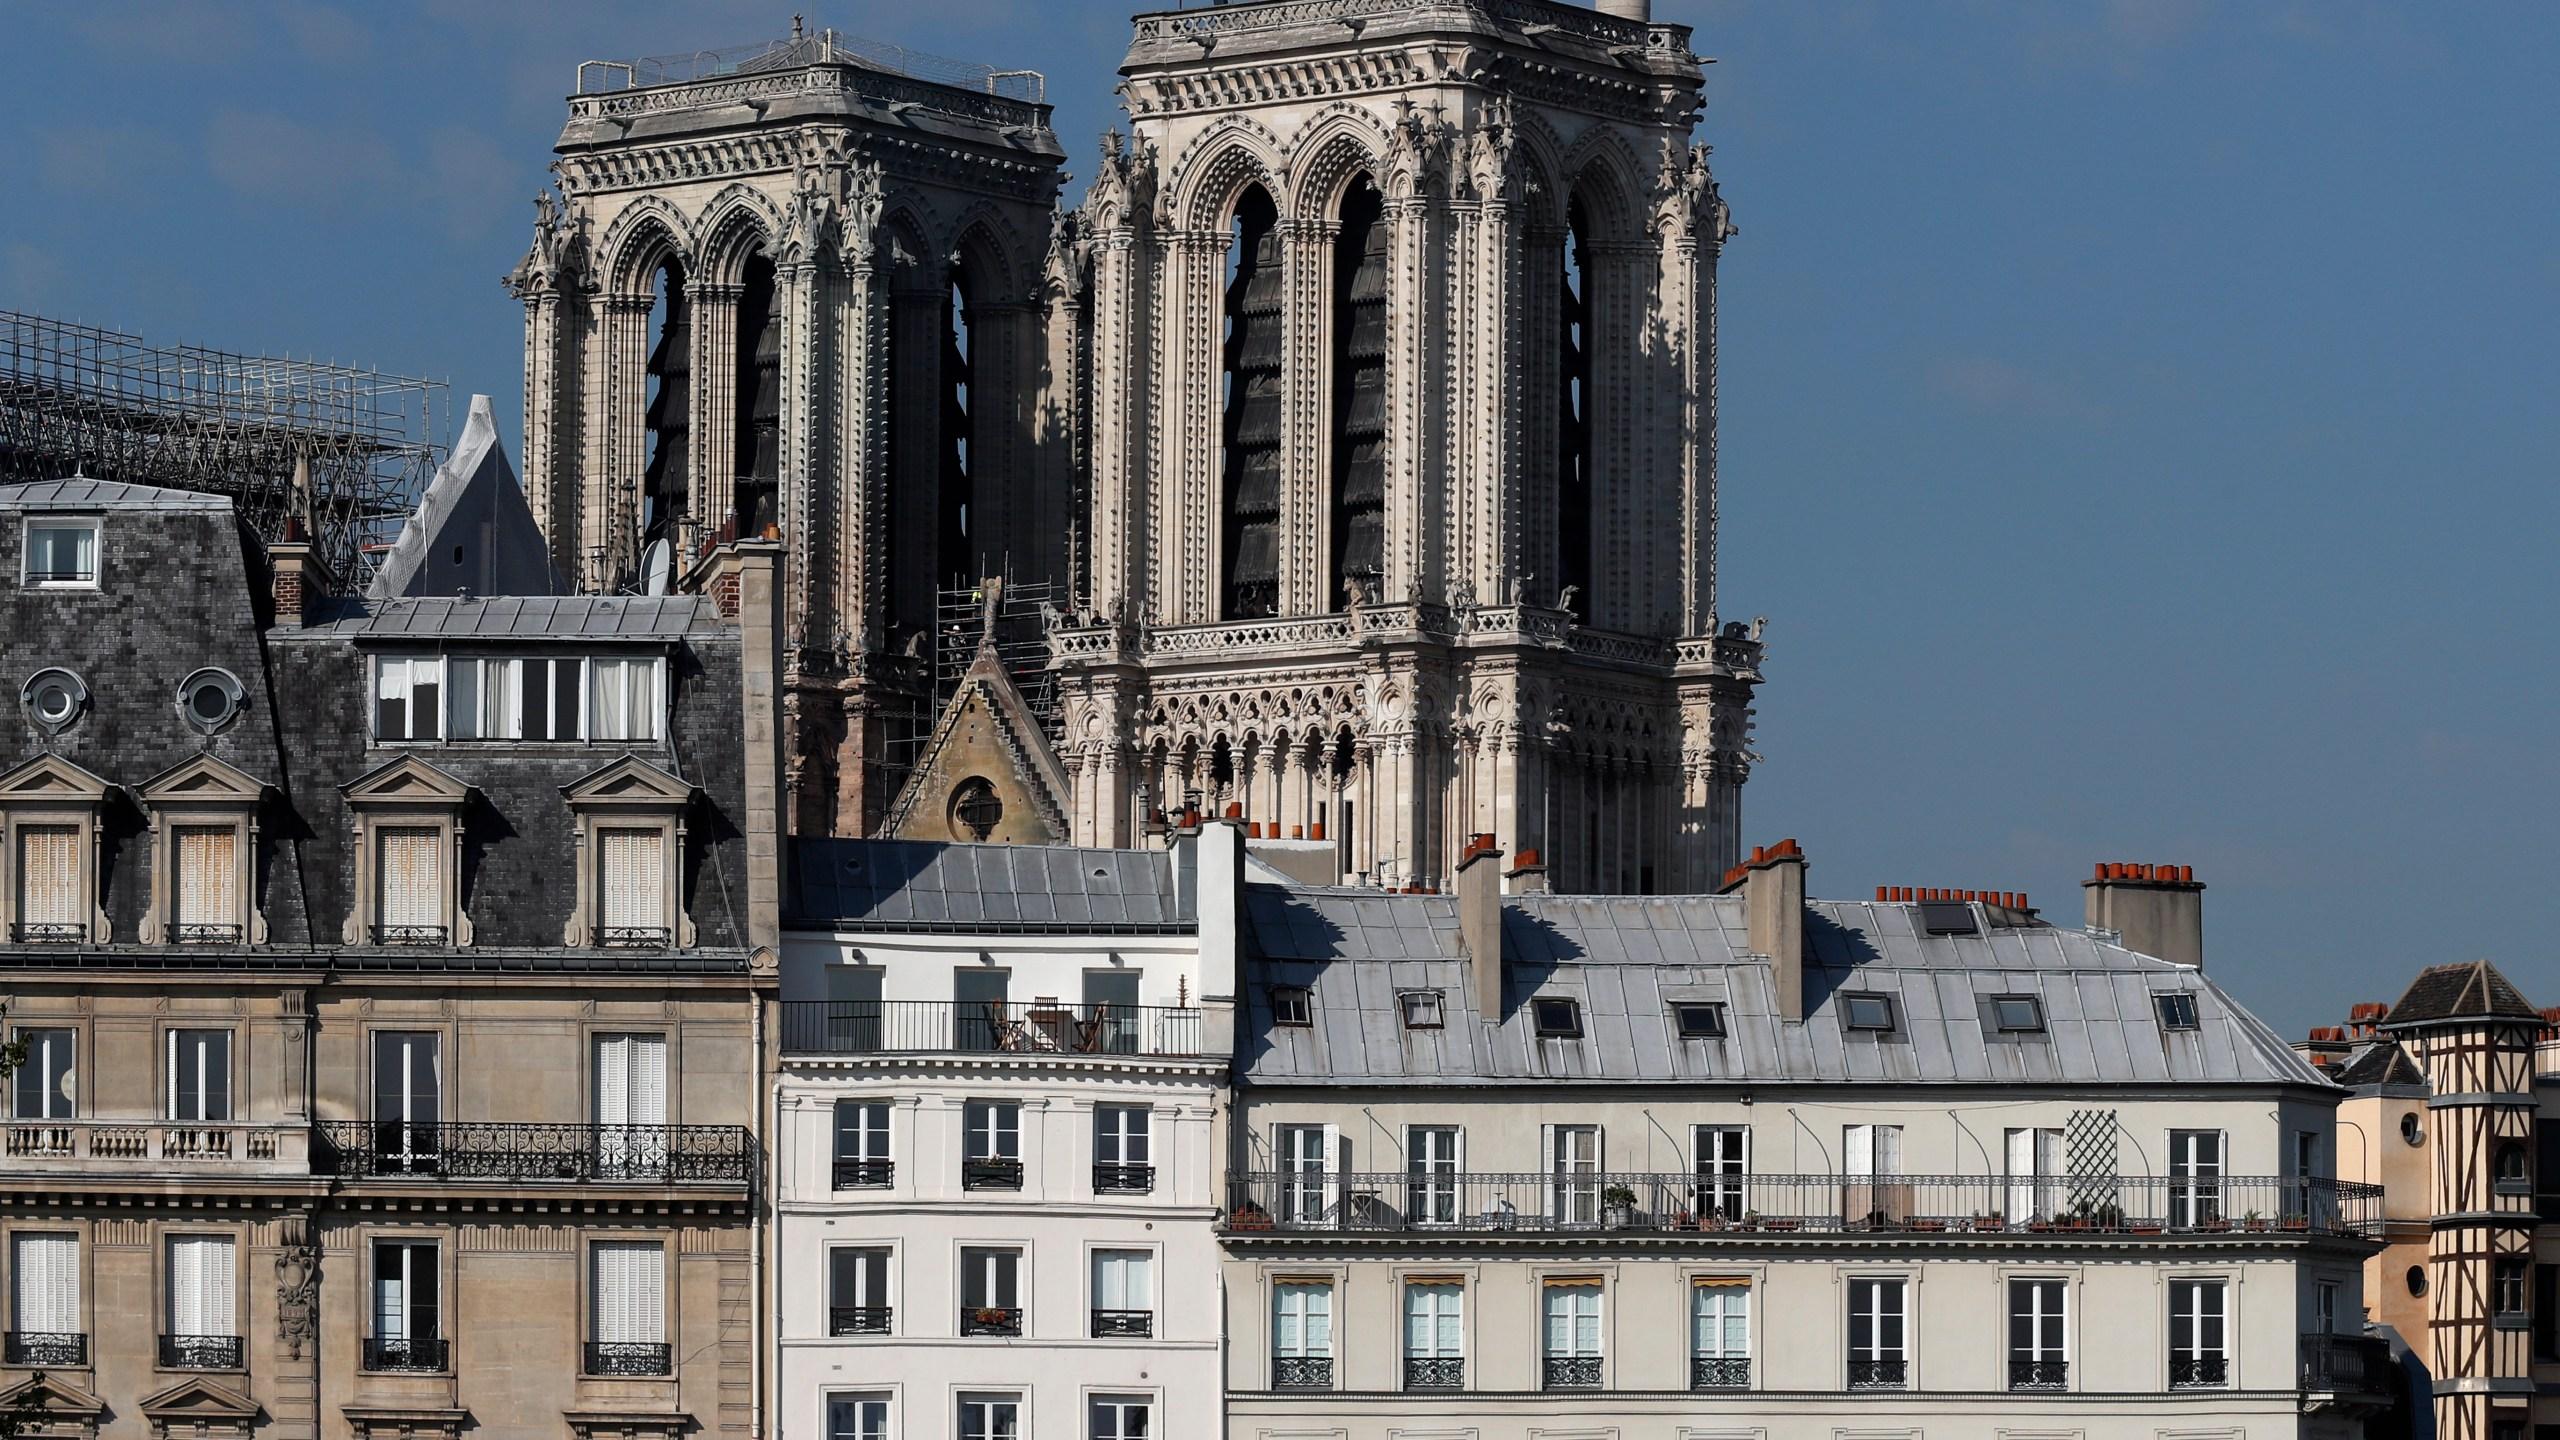 France_Notre_Dame_Fire_81831-159532.jpg14333497